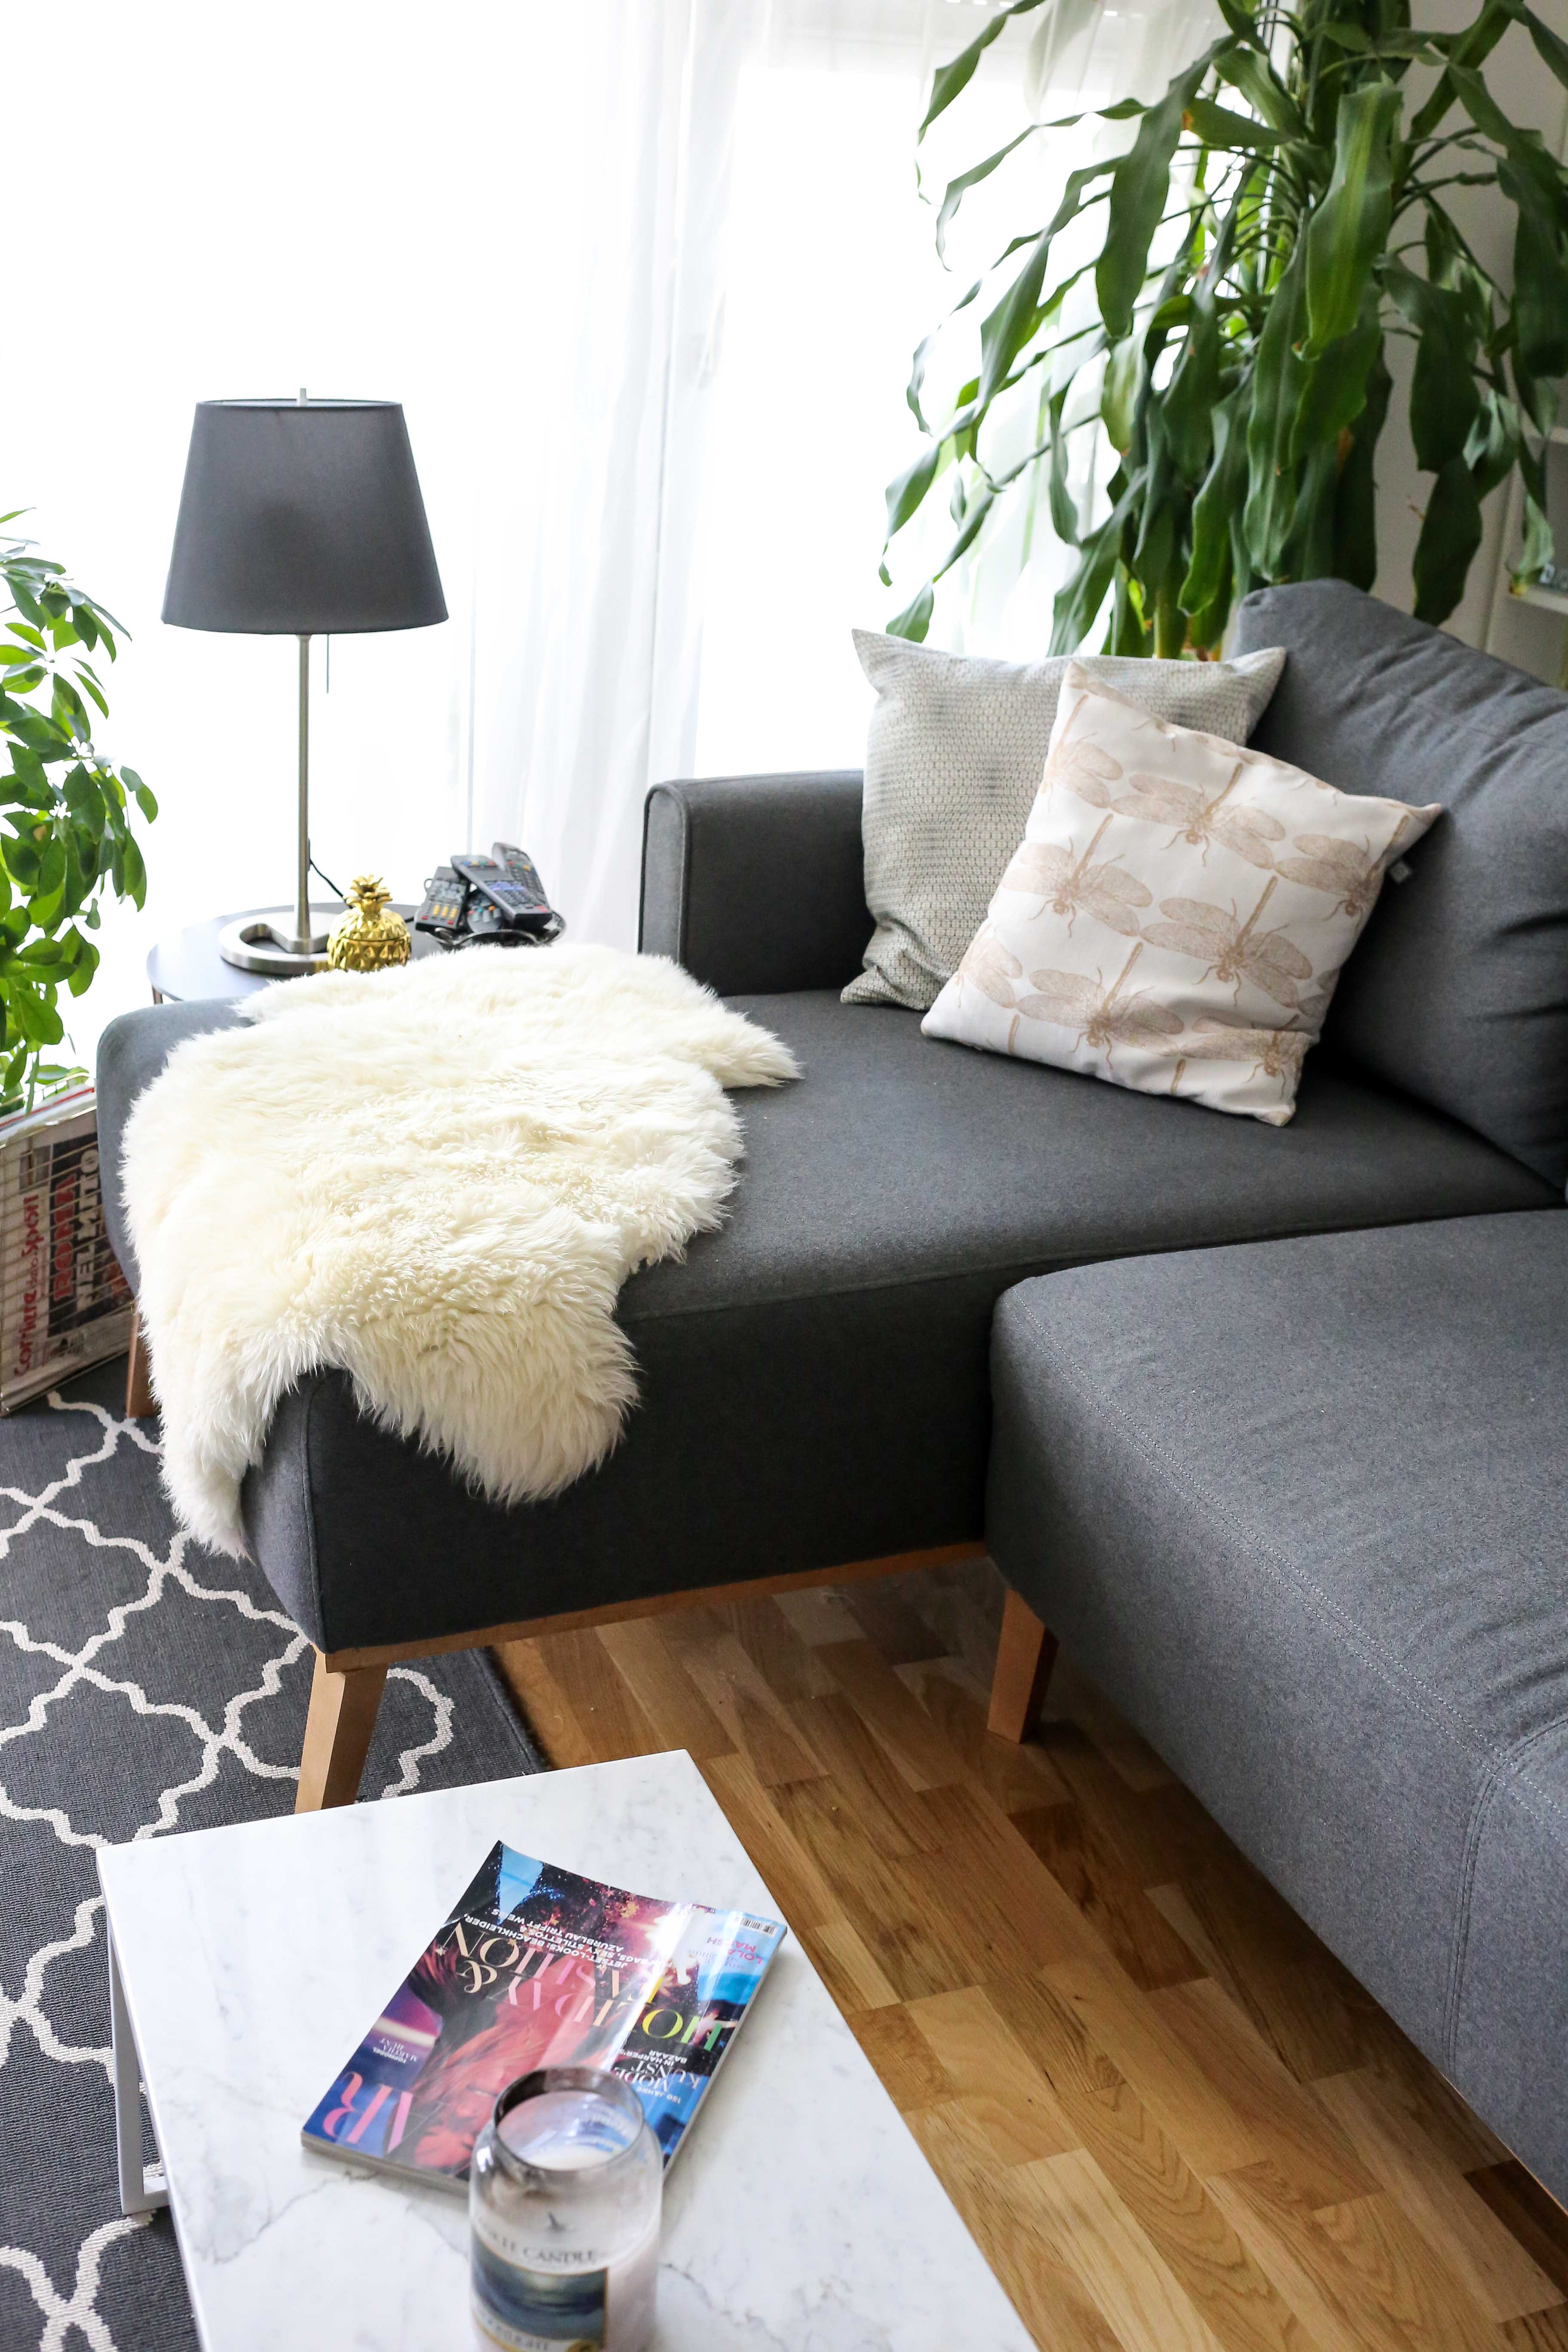 home-story-wohnzimmer-make-over-wayfair-scandi-ecksofa-tv-lowboard-interior